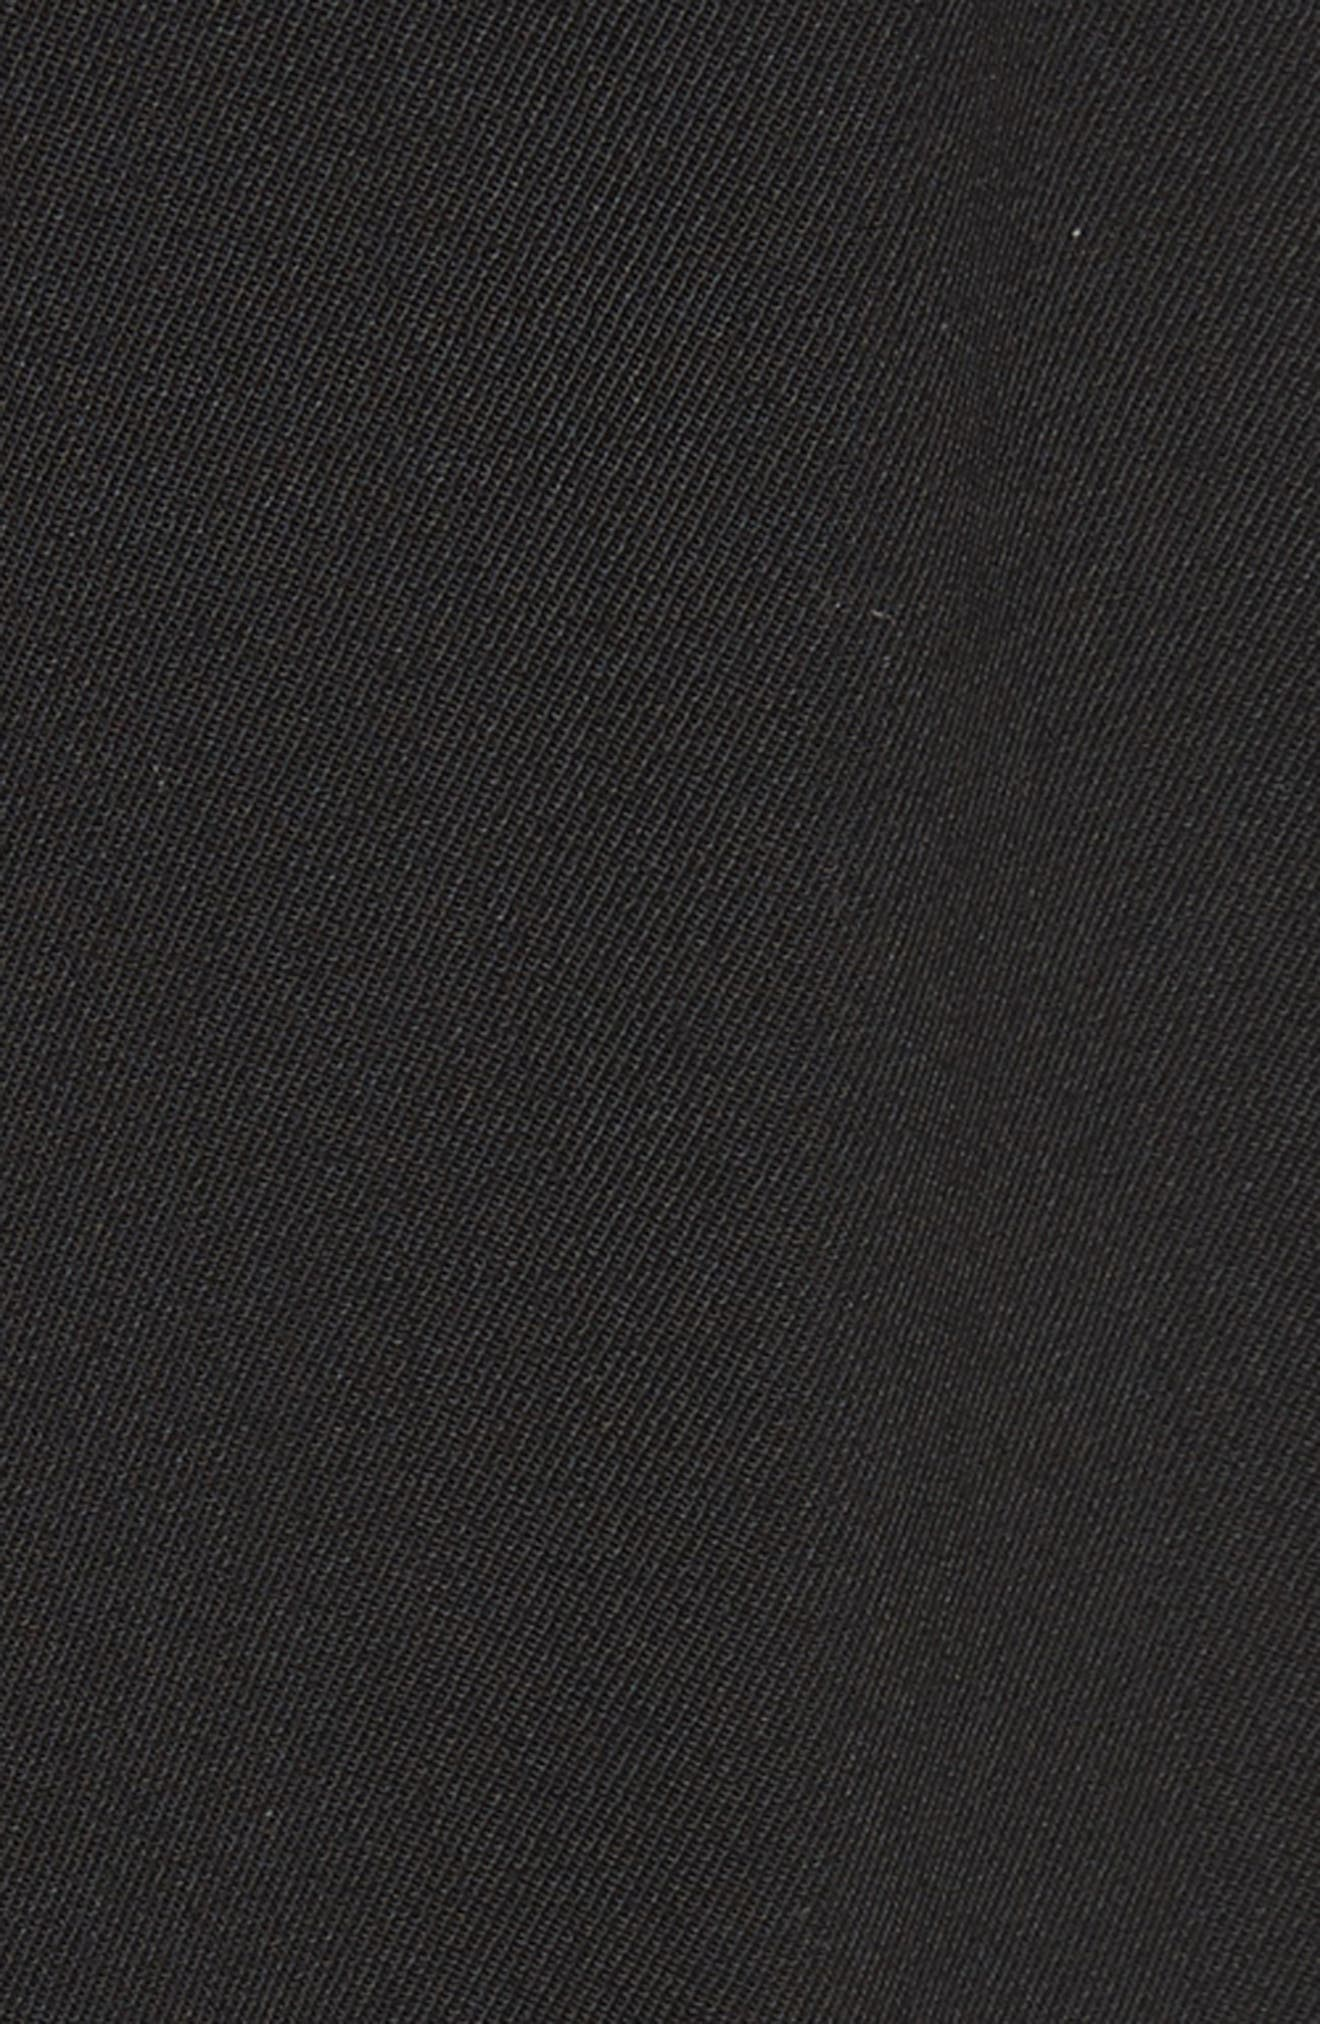 Alternate Image 5  - Rebecca Stretch Wool Tuxedo Pants